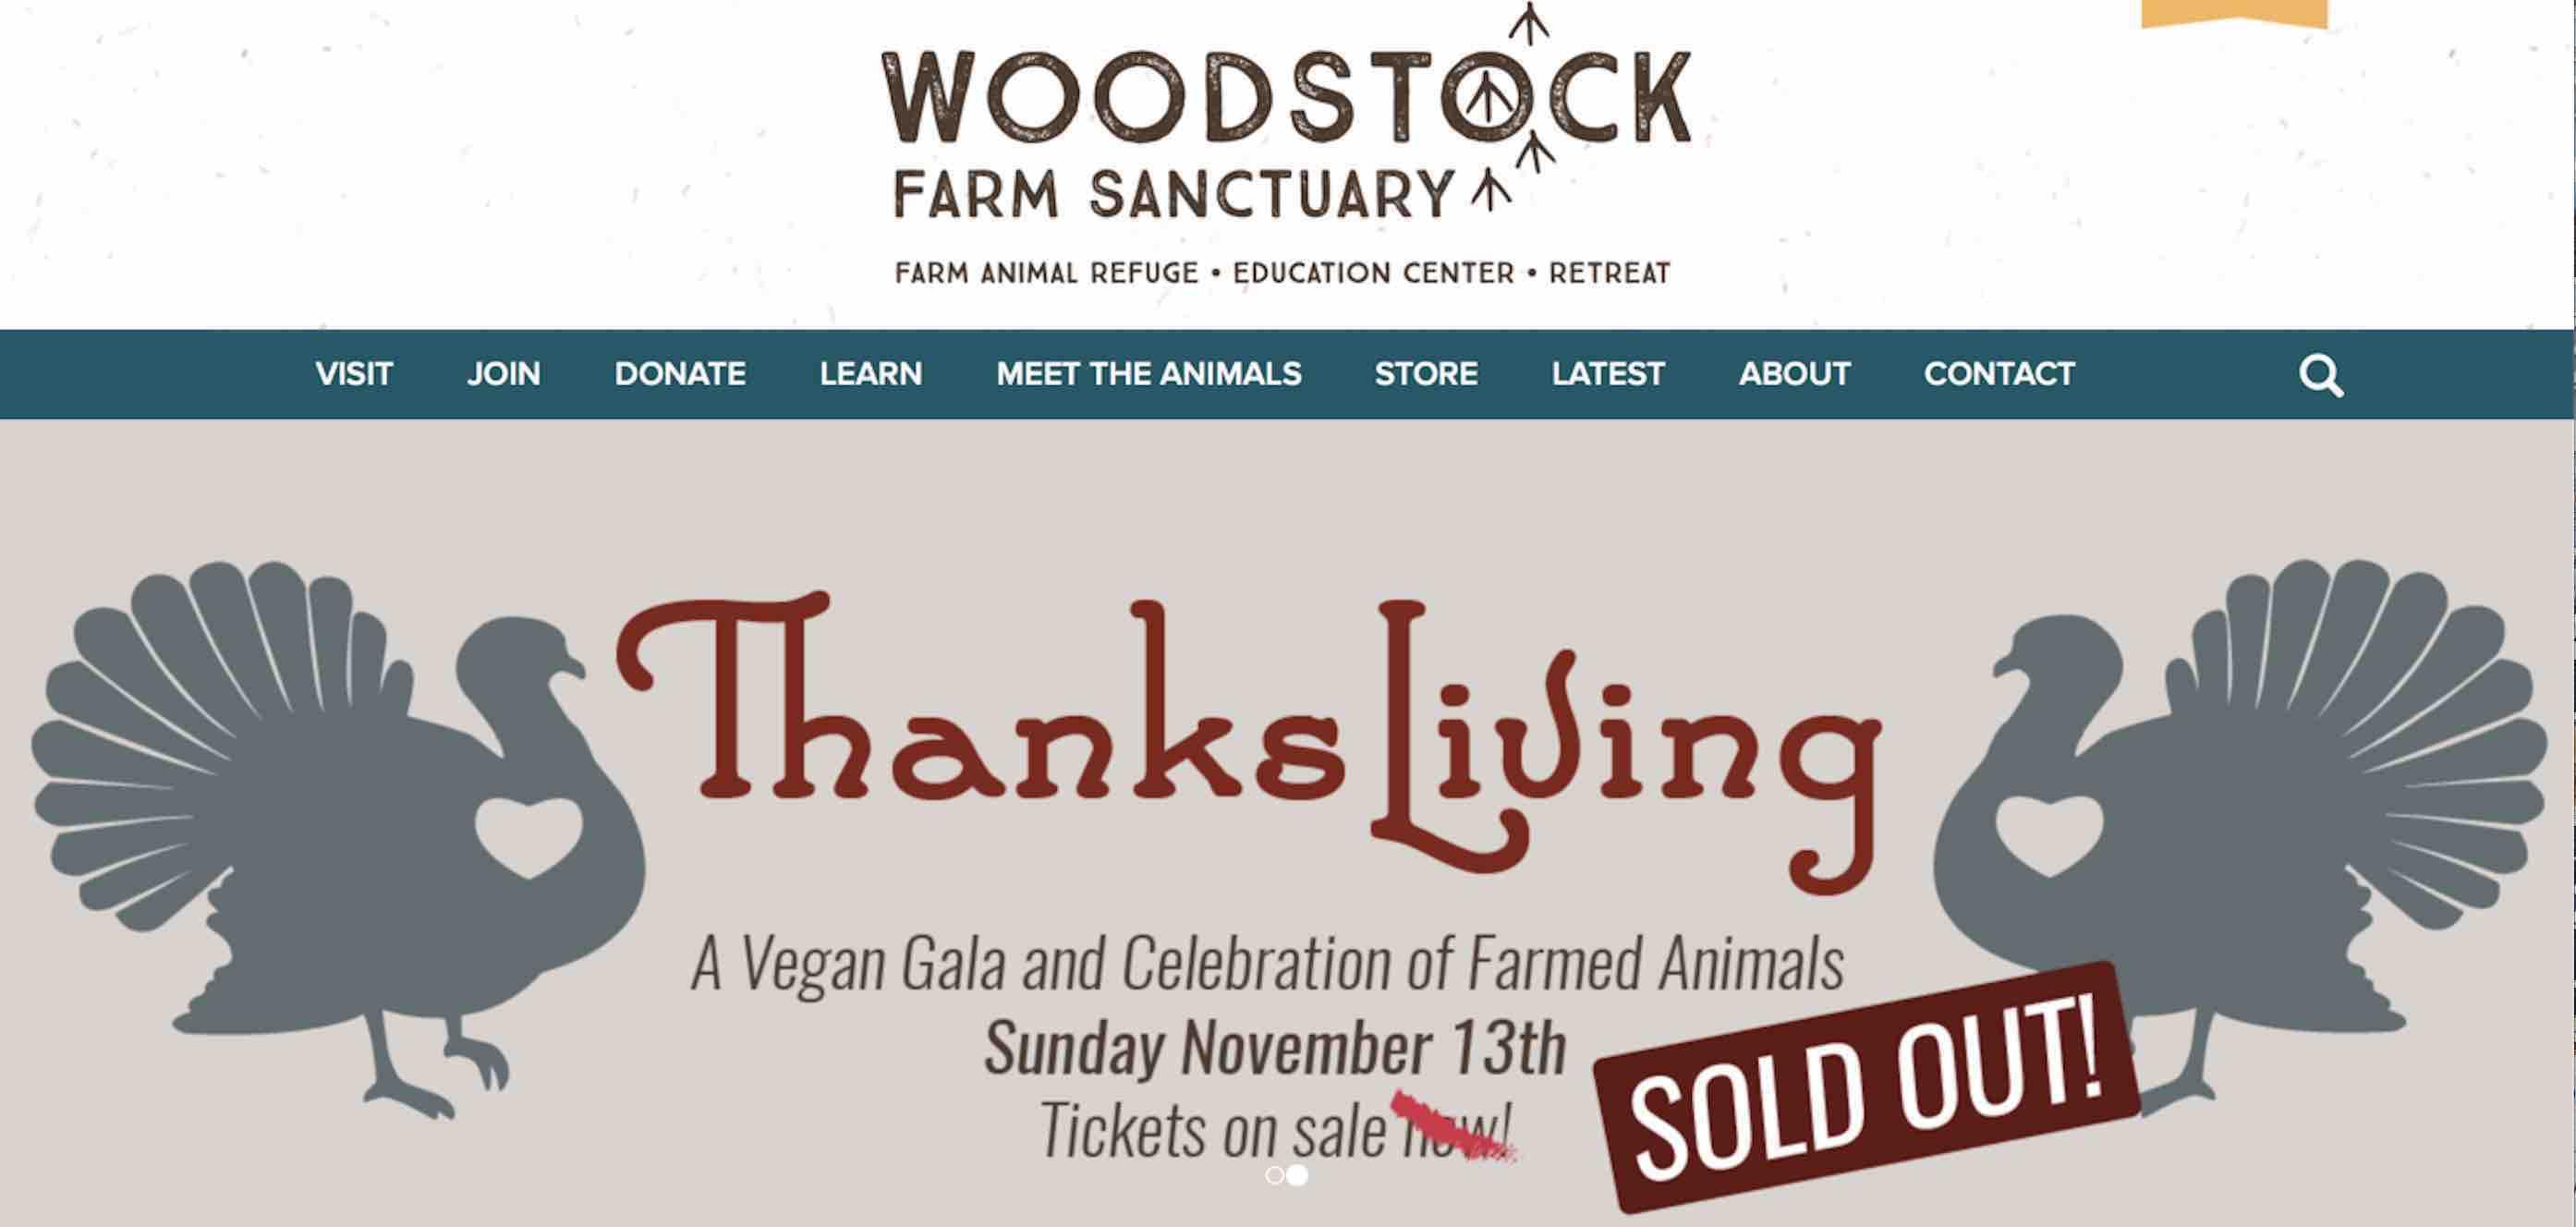 2016 ThanksLiving celebration at Woodstock Farm Sanctuary